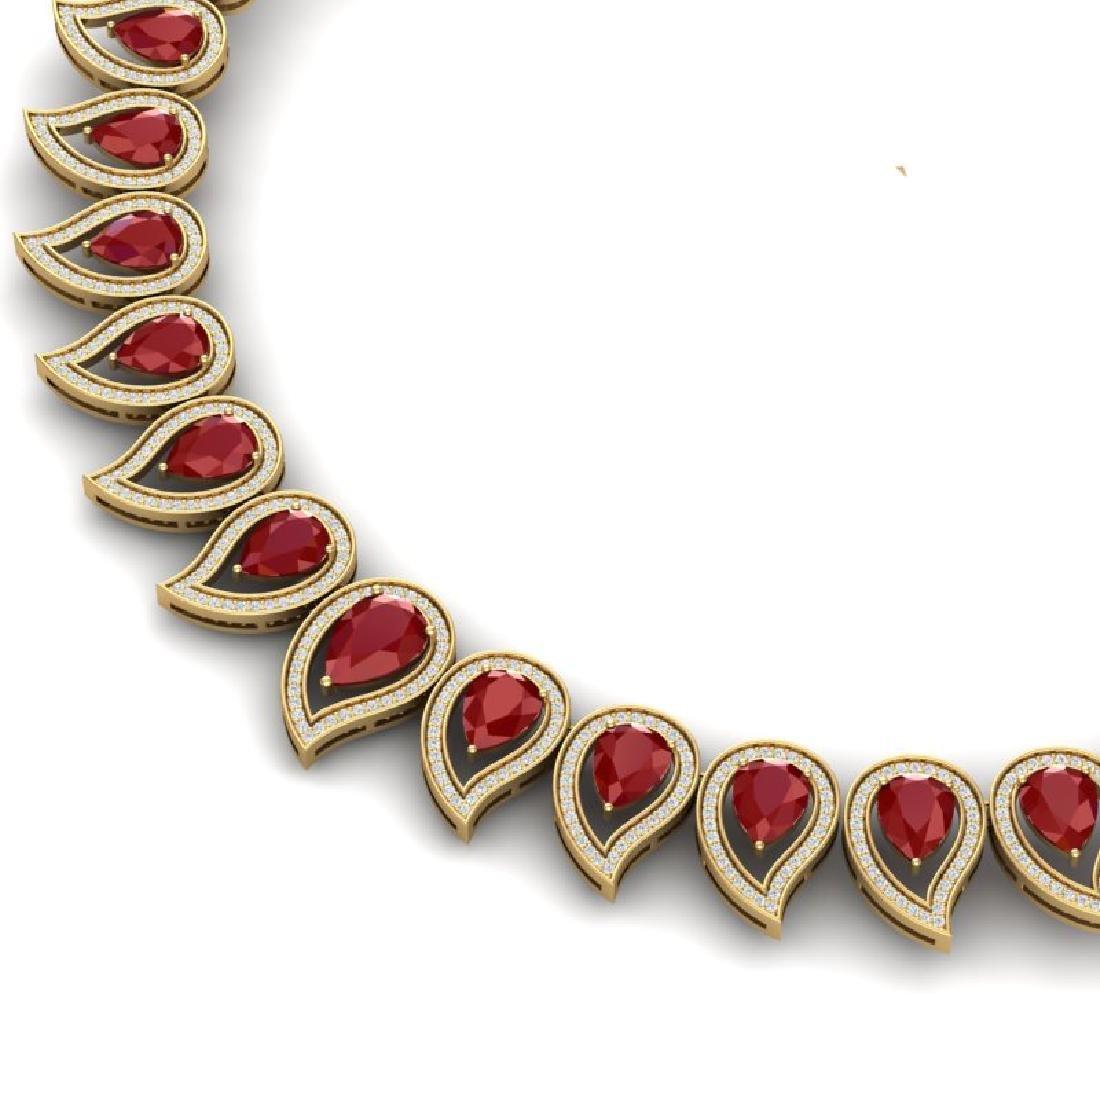 33.4 CTW Royalty Designer Ruby & VS Diamond Necklace - 2